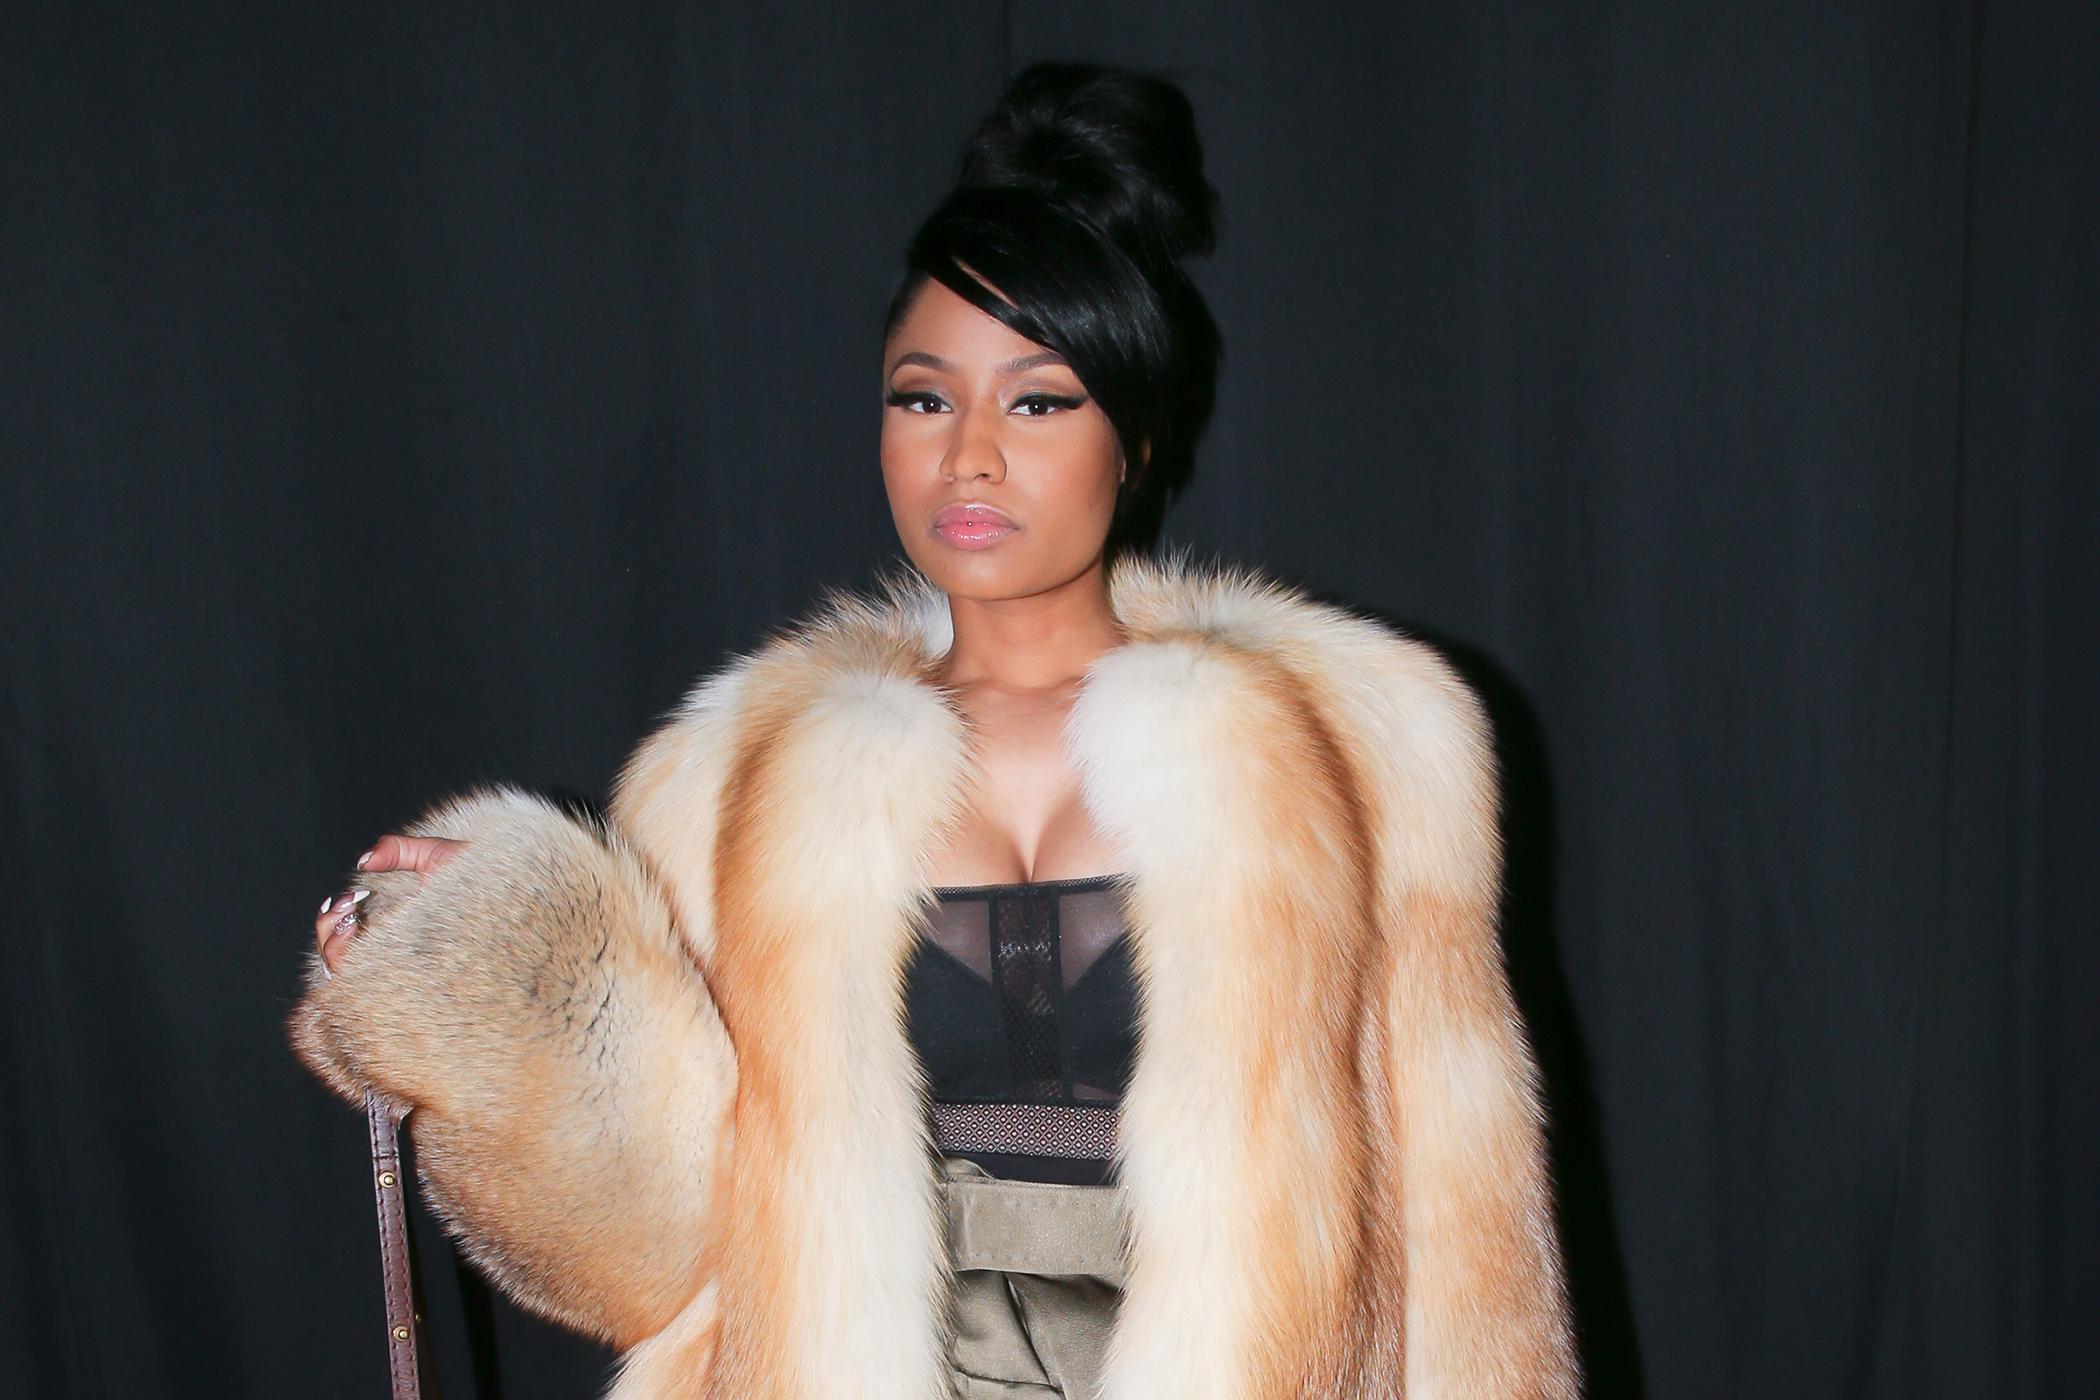 Nicki Minaj at the Marc Jacobs Fall/Winter 2015 Fashion Show at the Park Avenue Armory, New York City, February 19, 2015.